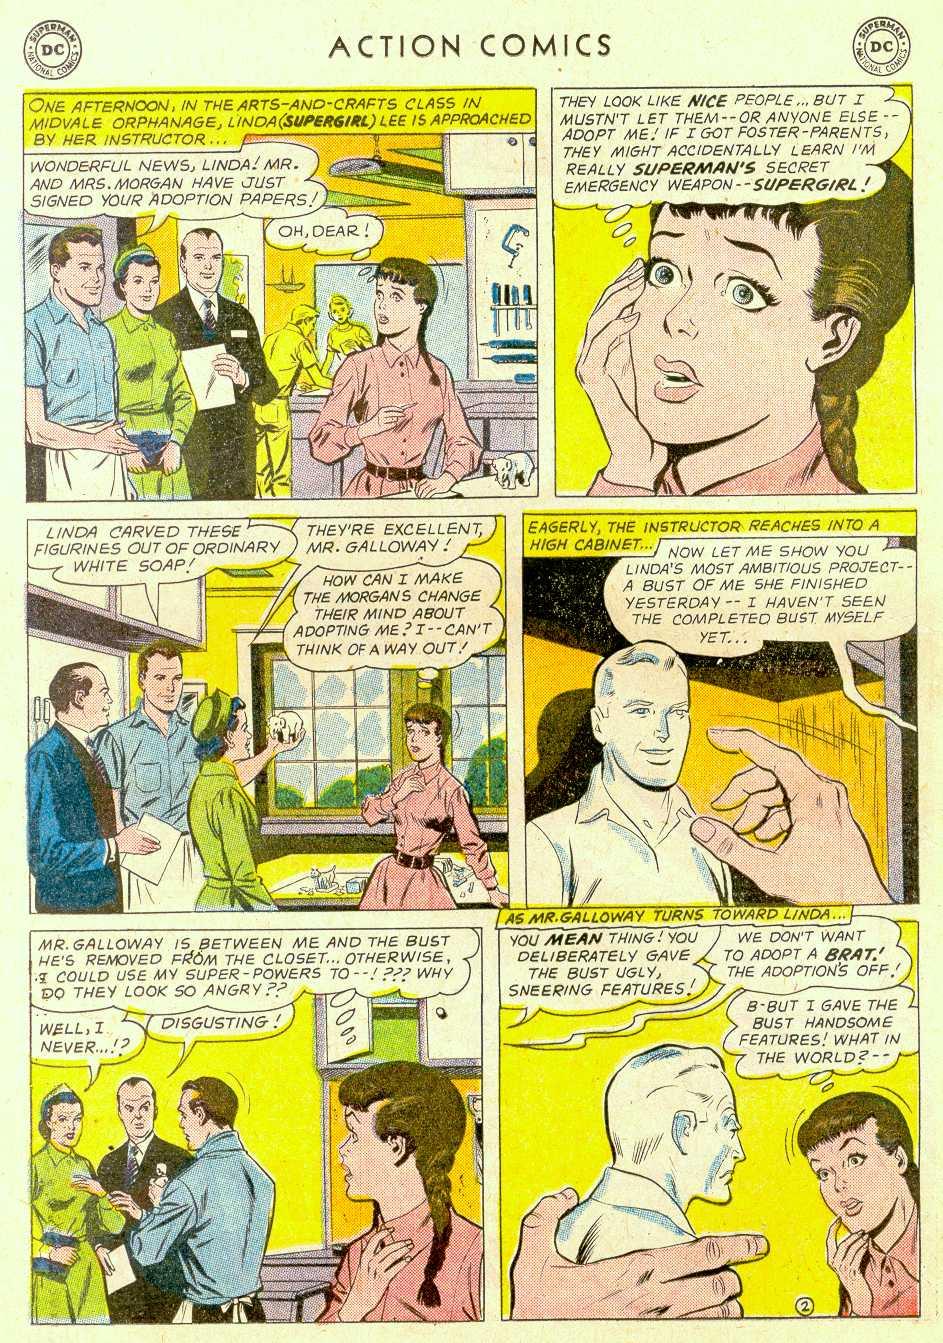 Action Comics (1938) 277 Page 19